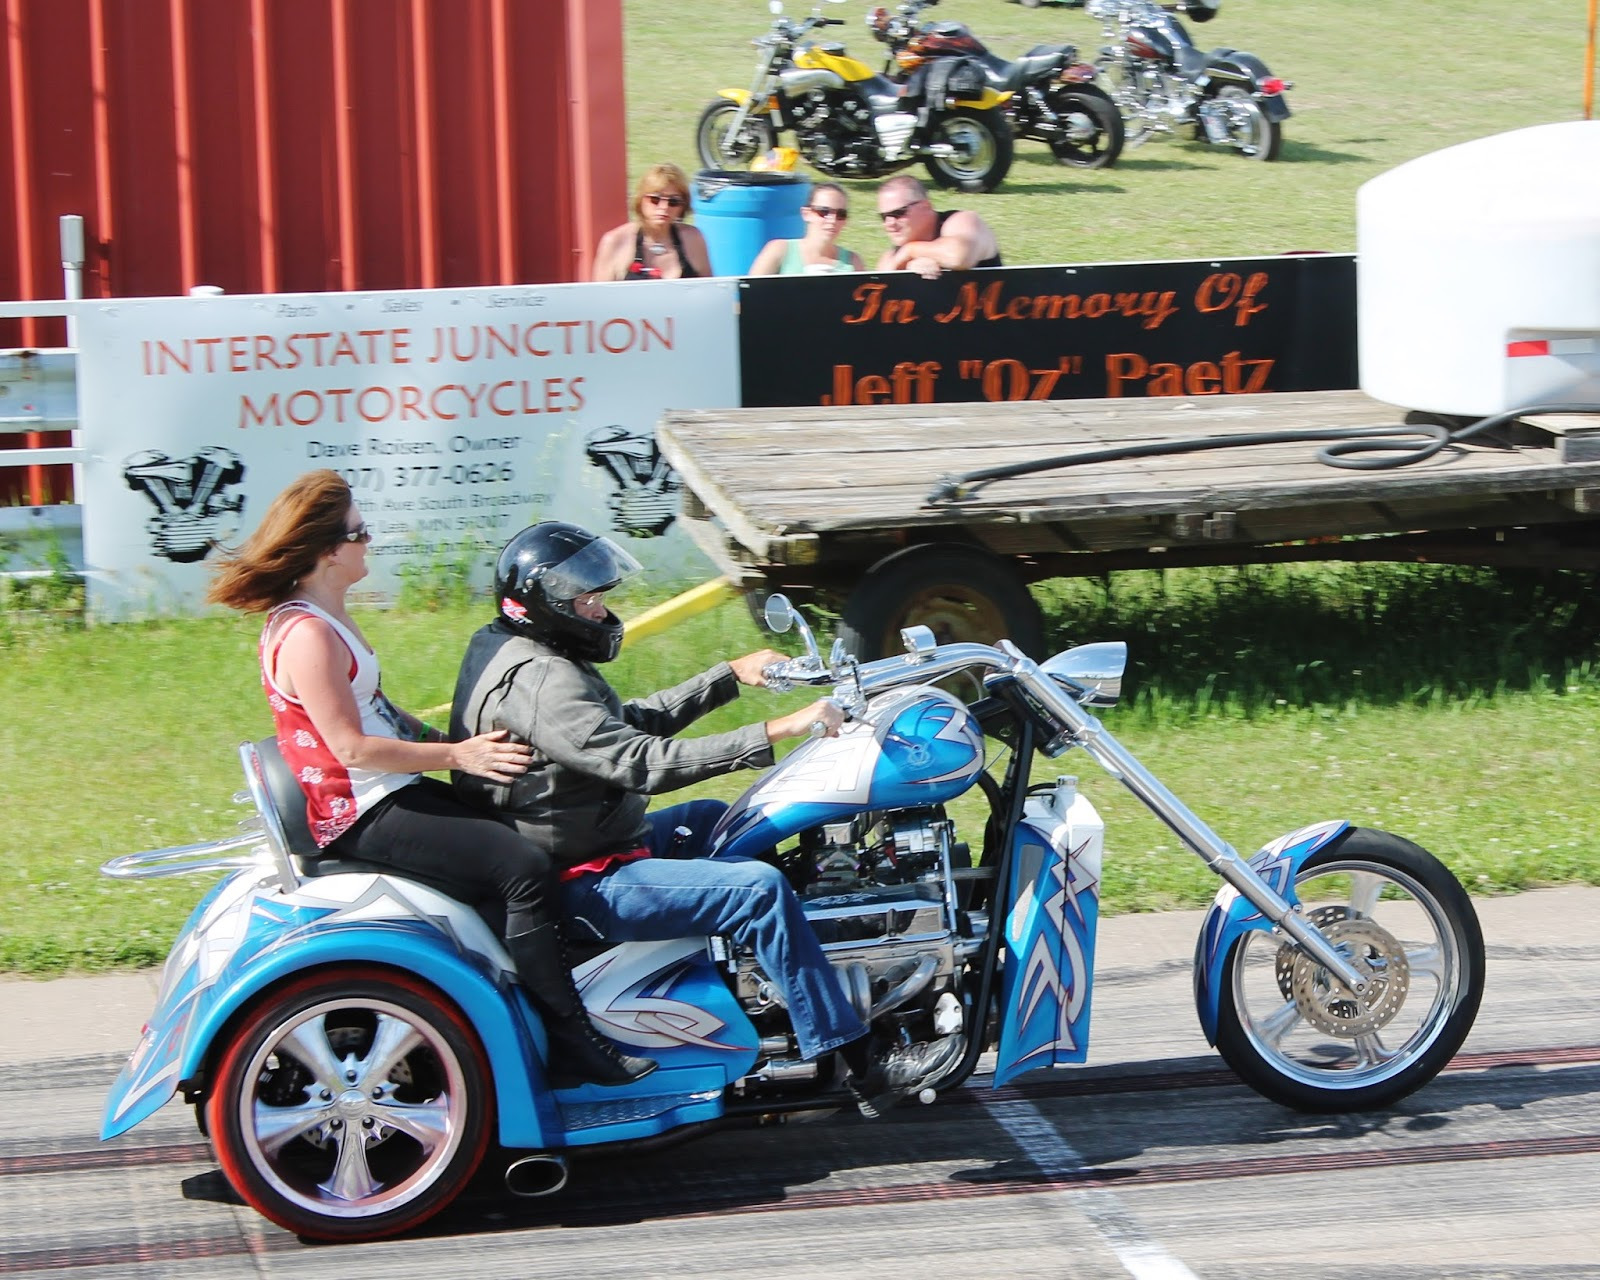 conesville women Races at conesville, ia conesville,ia (thunder in the sand 2008) races at conesville, ia done.